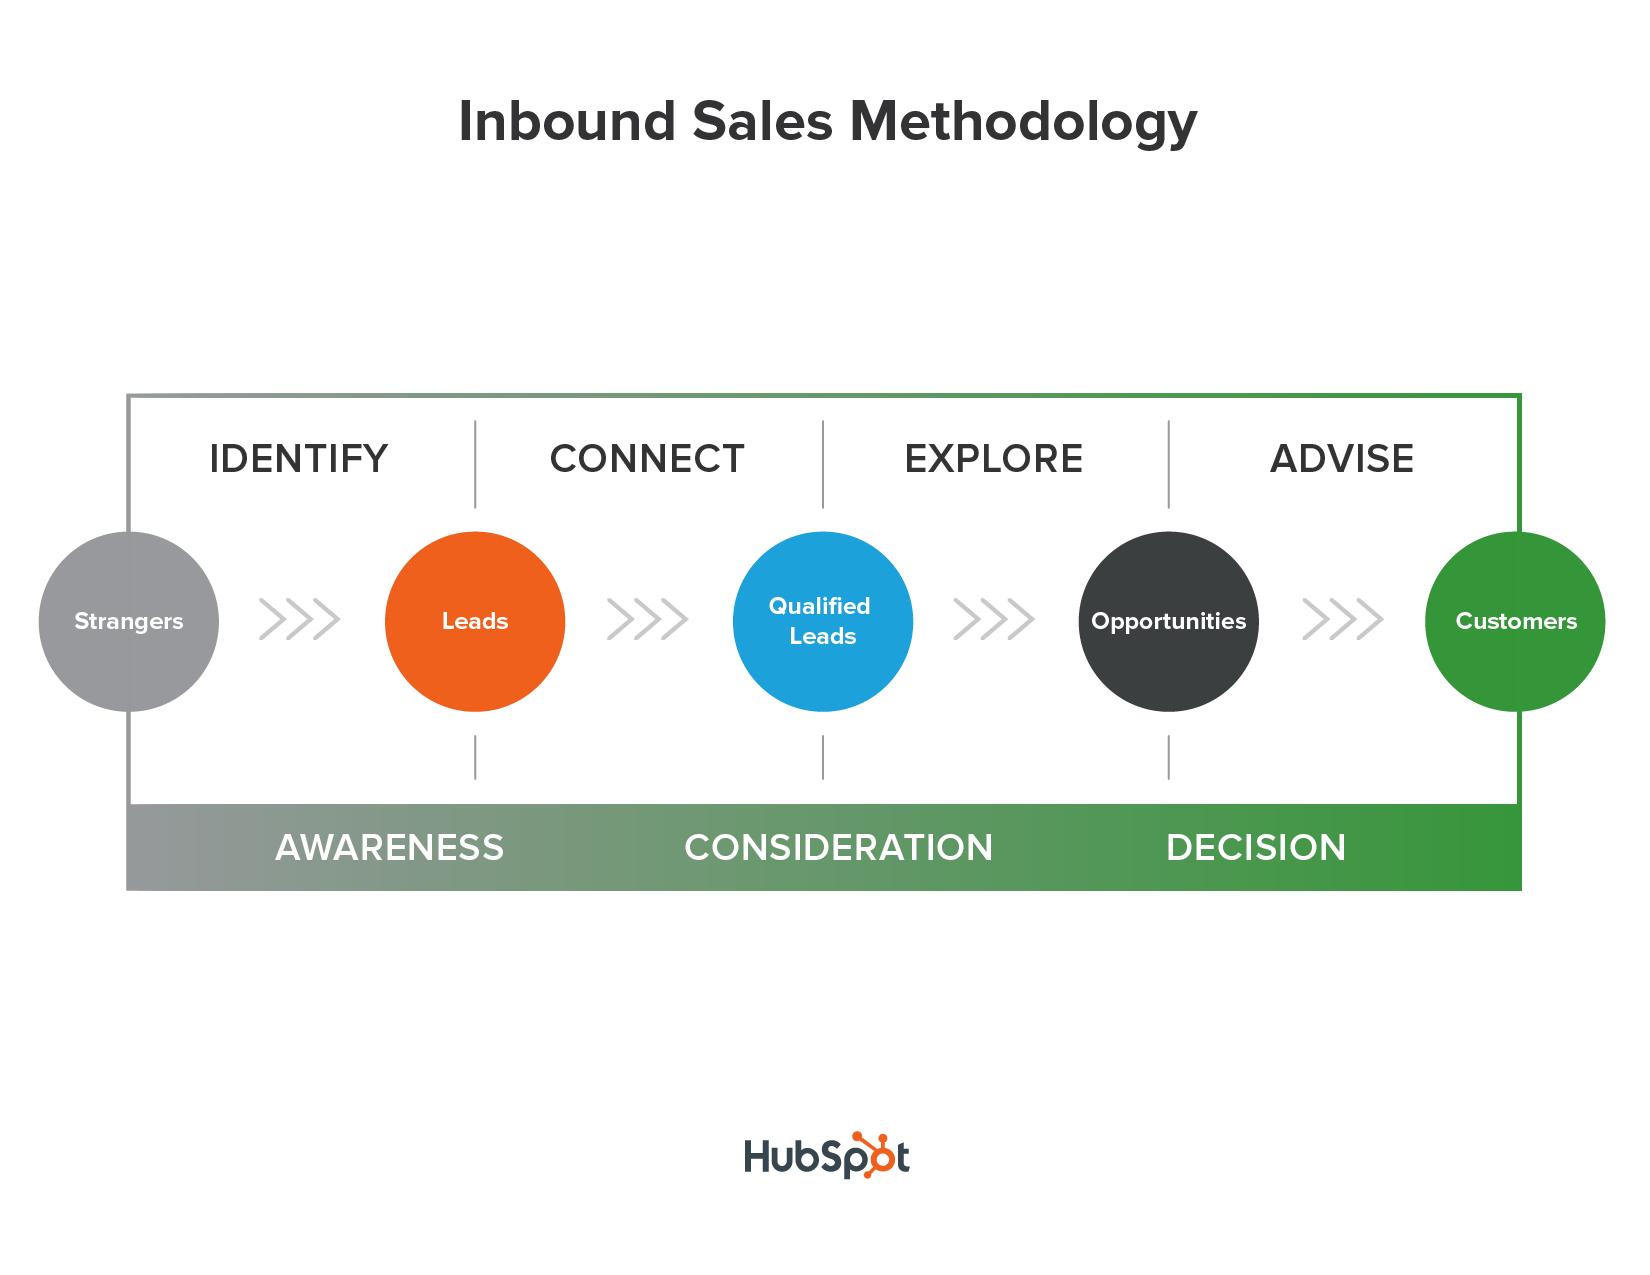 Hubspot_sales_methodology-01_11.54.57.png